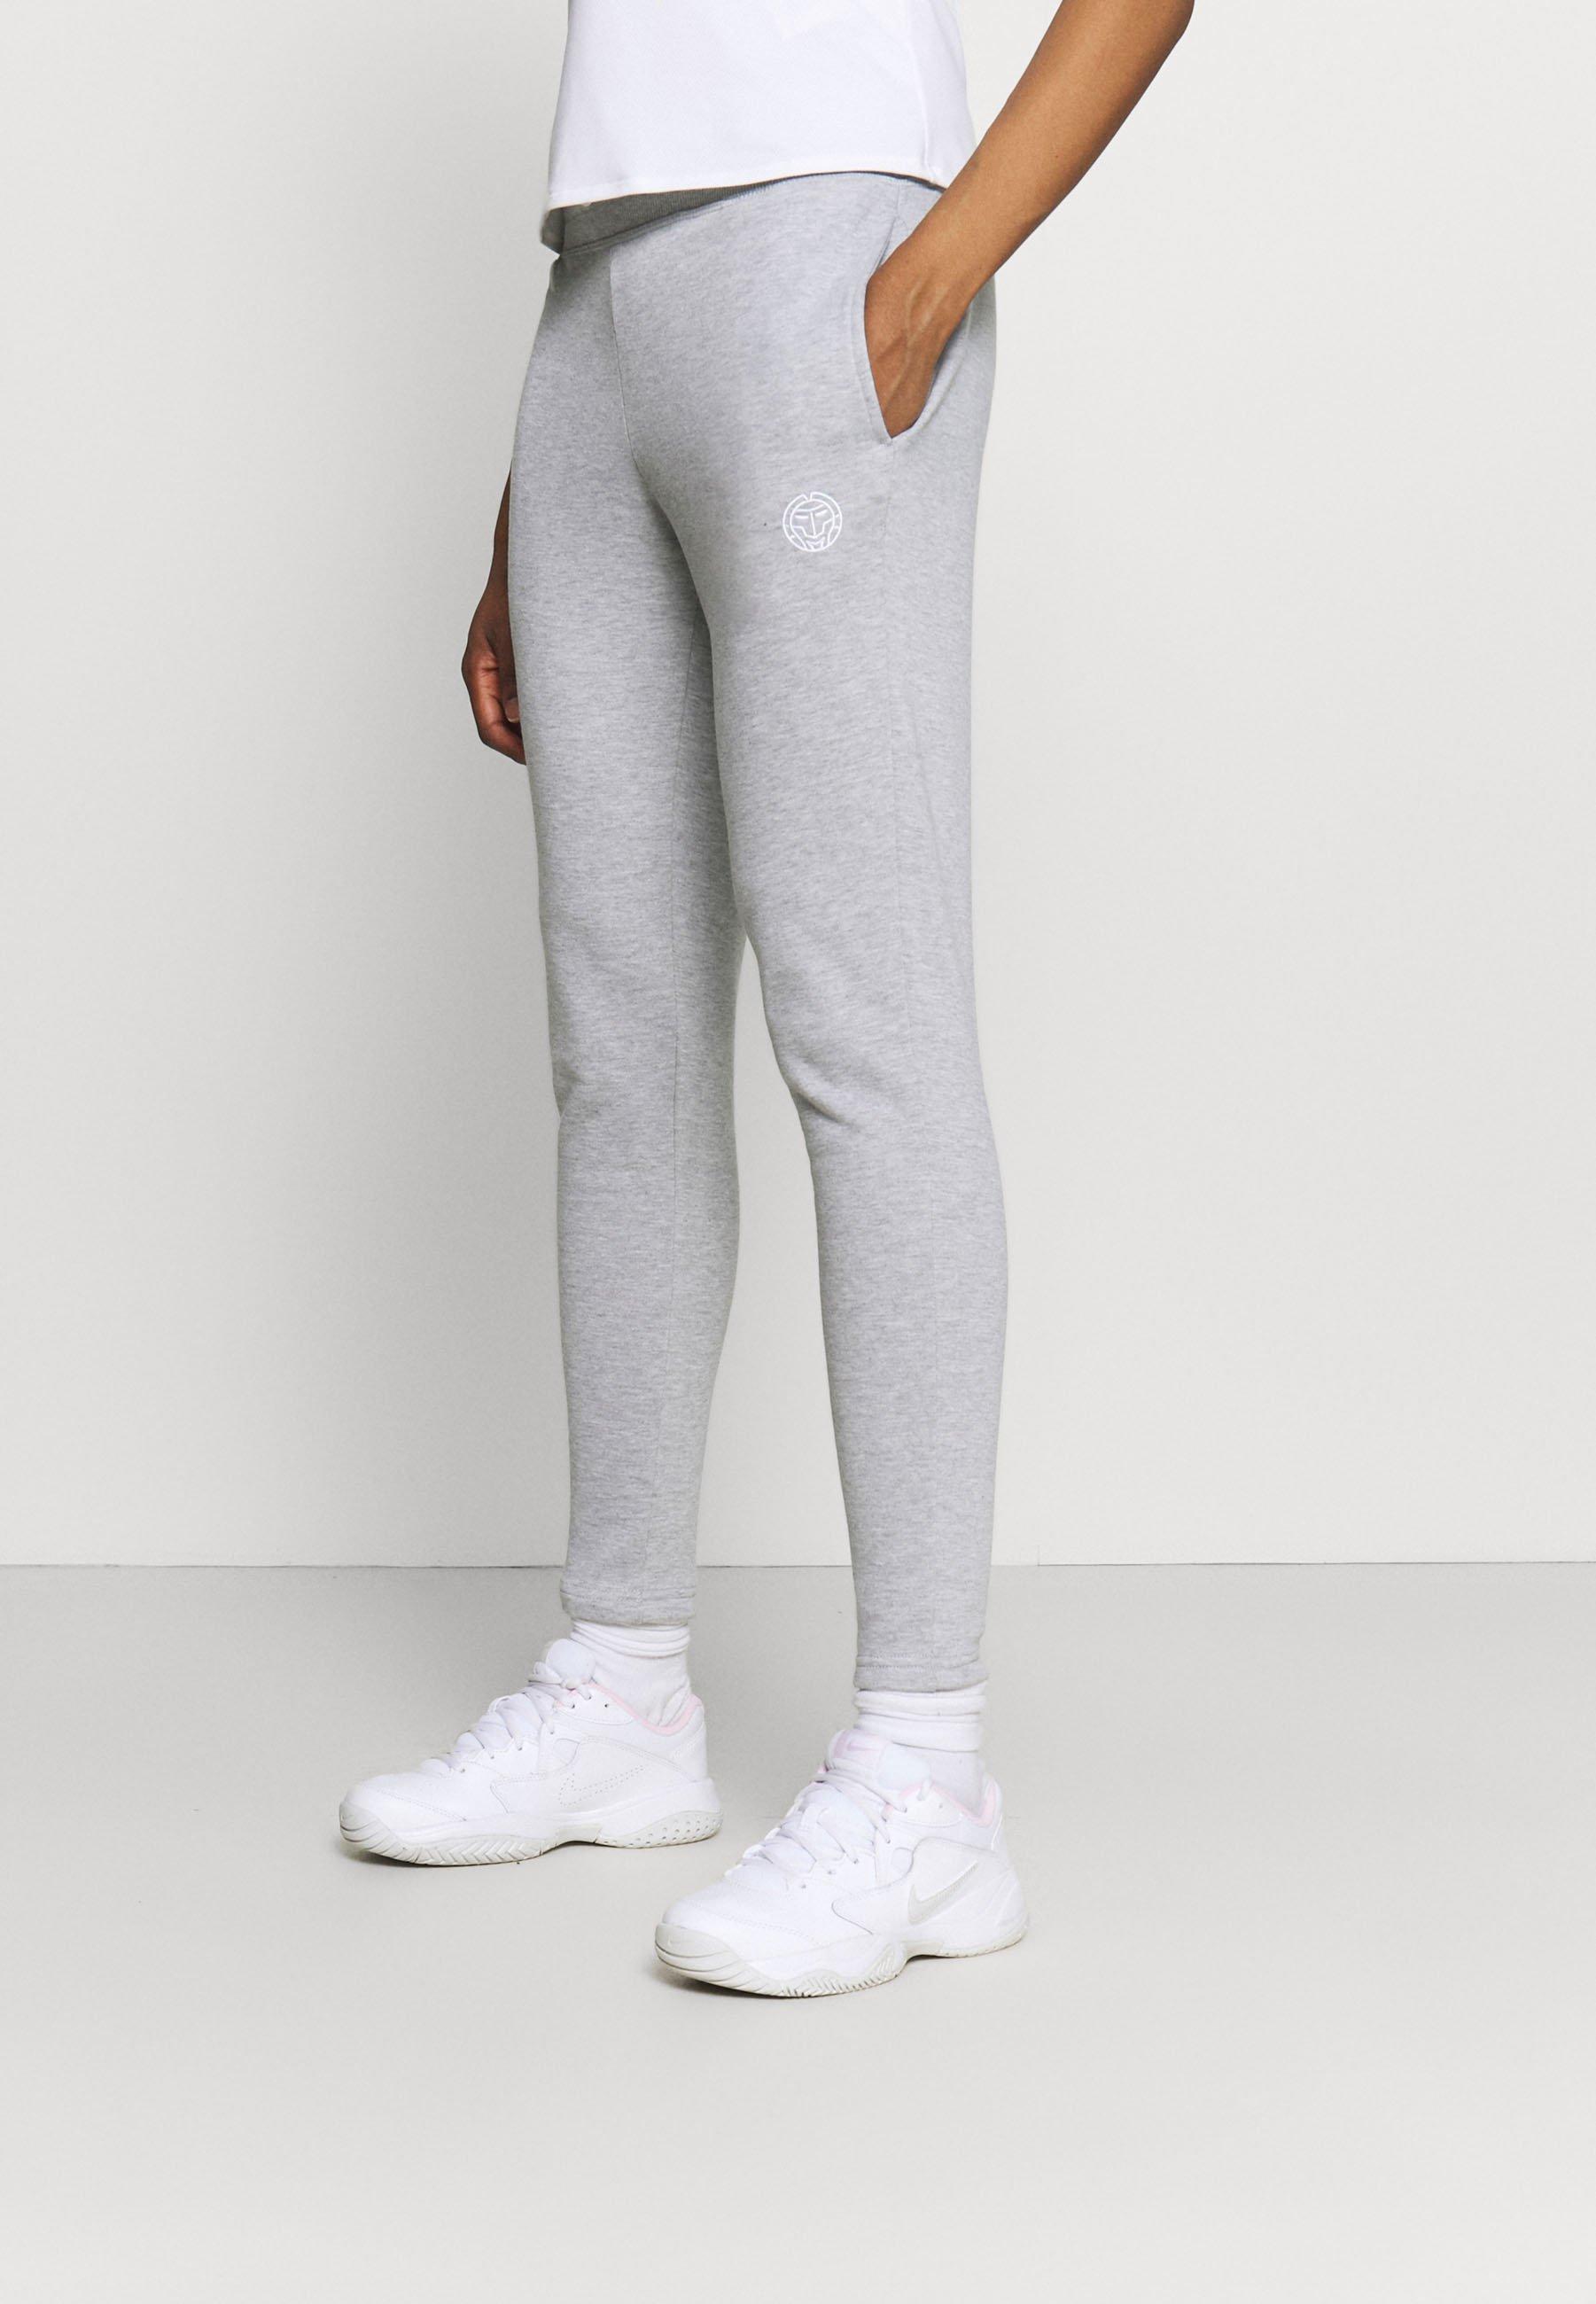 Damen AYANDA BASIC PANT - Jogginghose